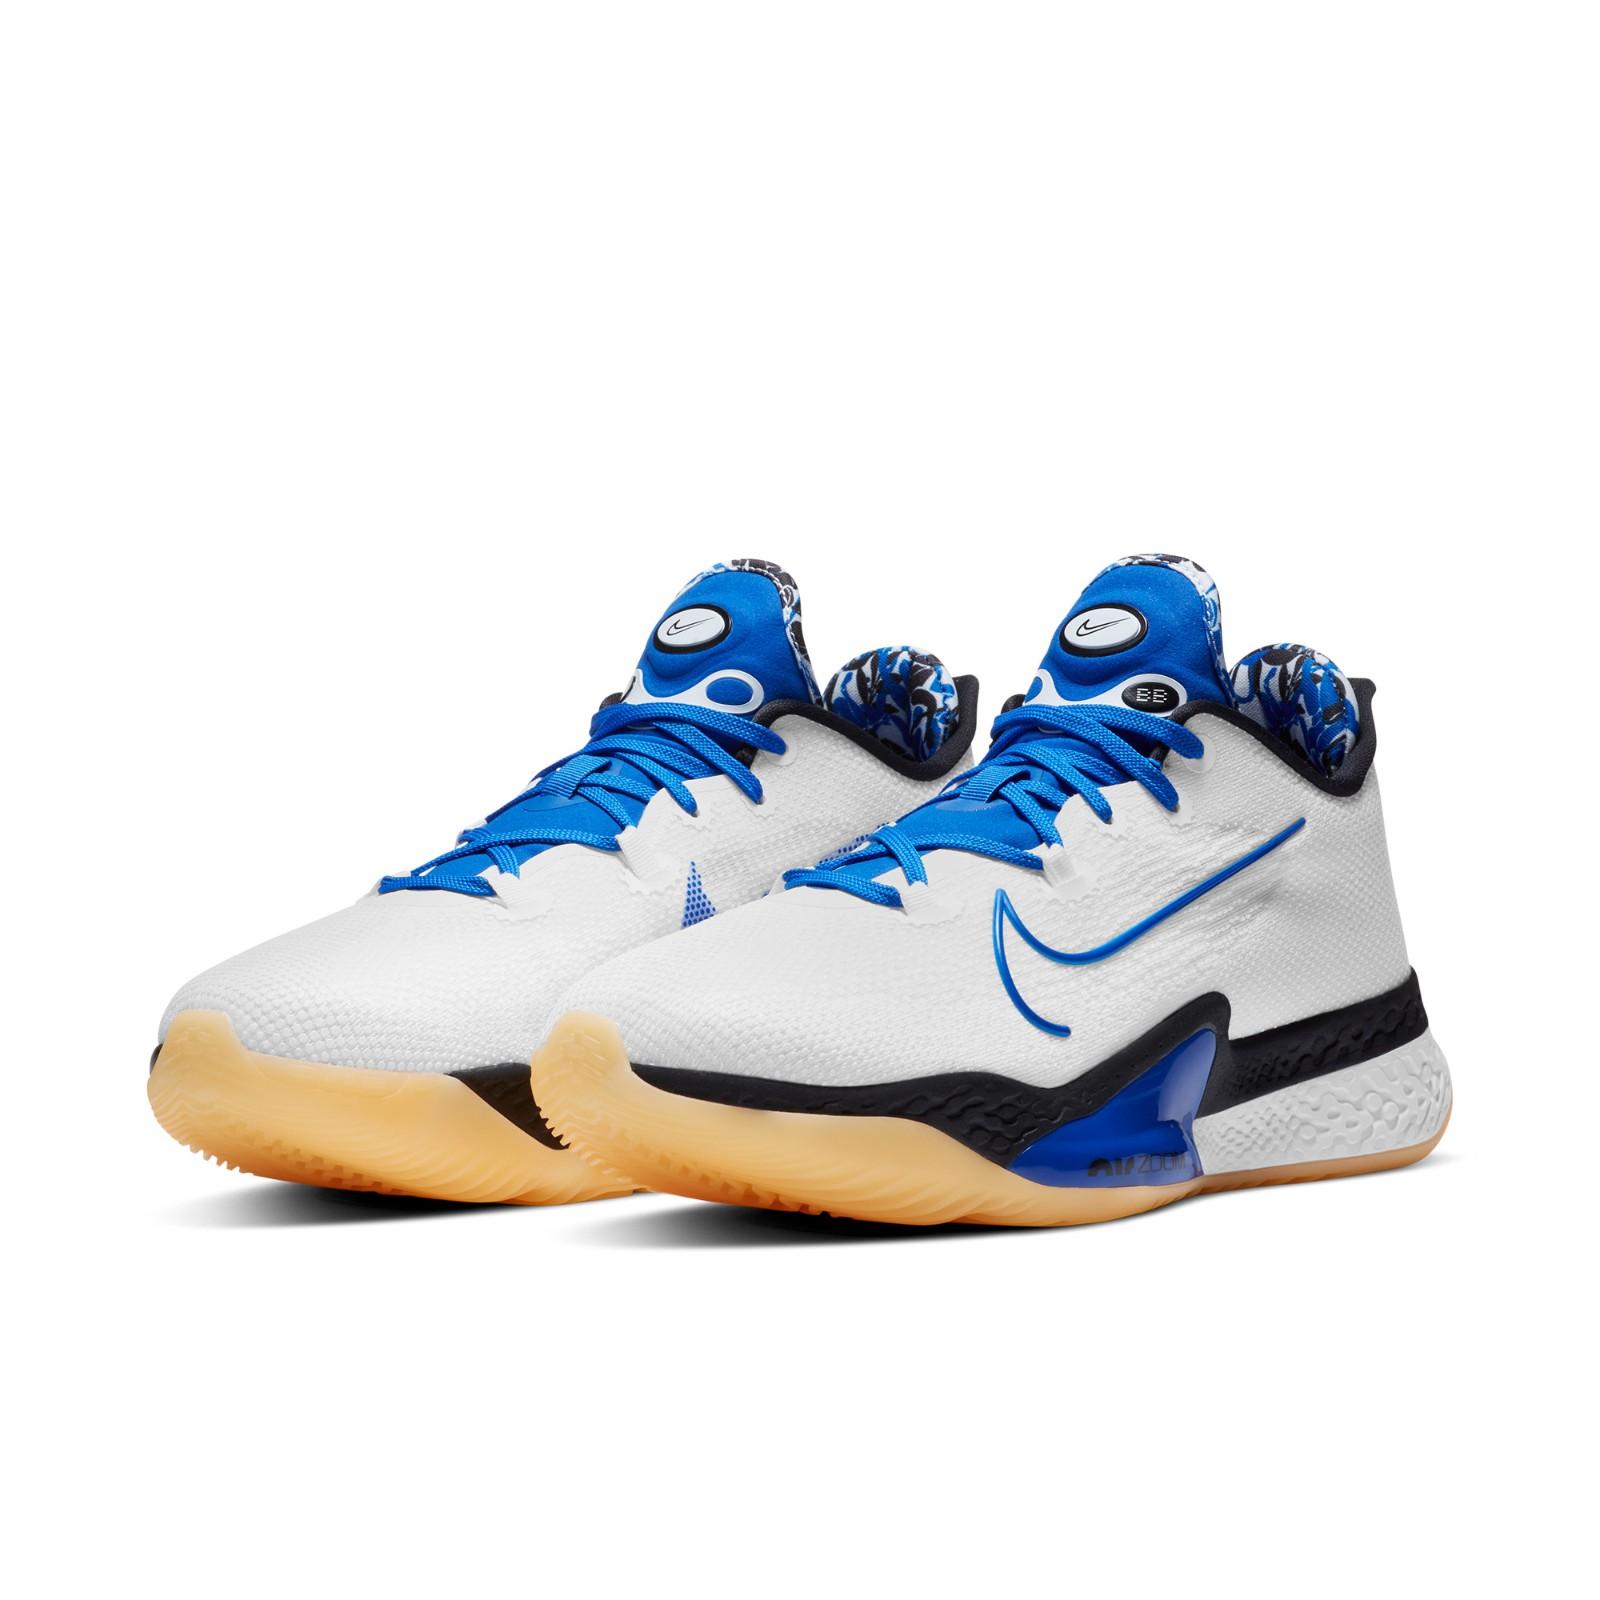 5日0点 : NIKE 耐克 AIR ZOOM BB NXT EP DB9991 男女款篮球鞋